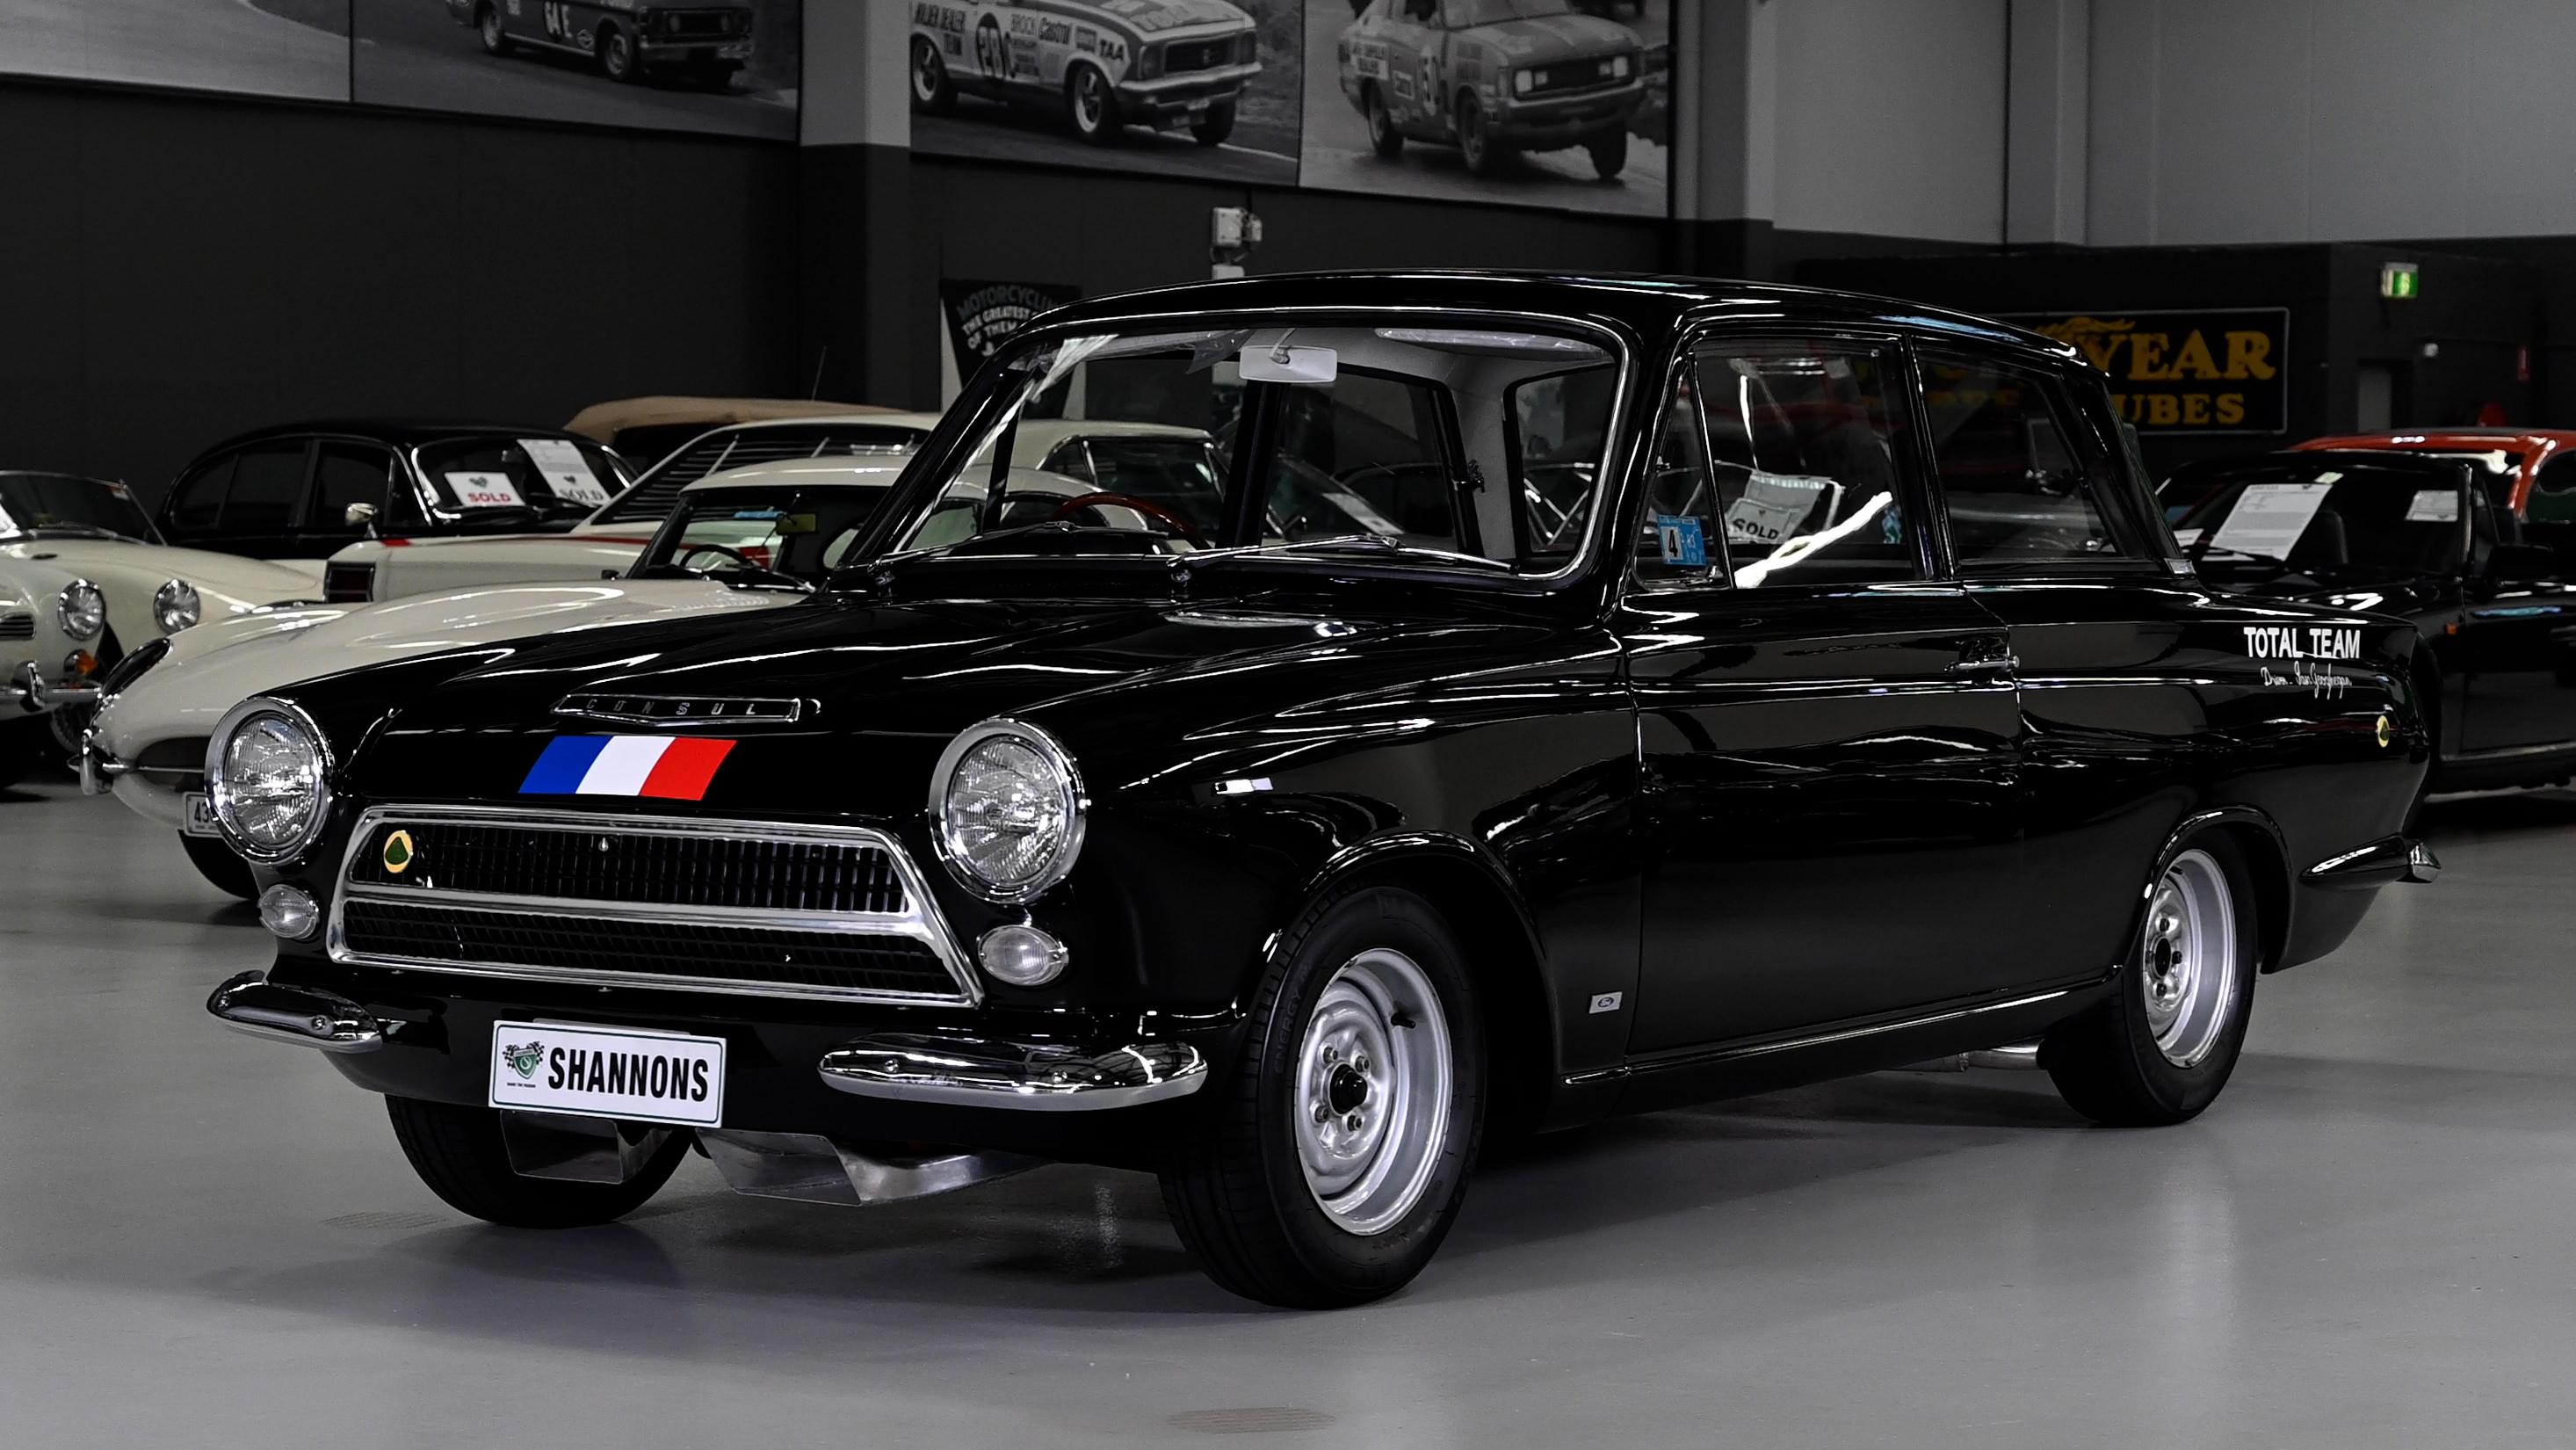 1964 Lotus Cortina Mk 1 'Works Prepared' 2Dr Sedan - 2021 Shannons Winter Timed Online Auction